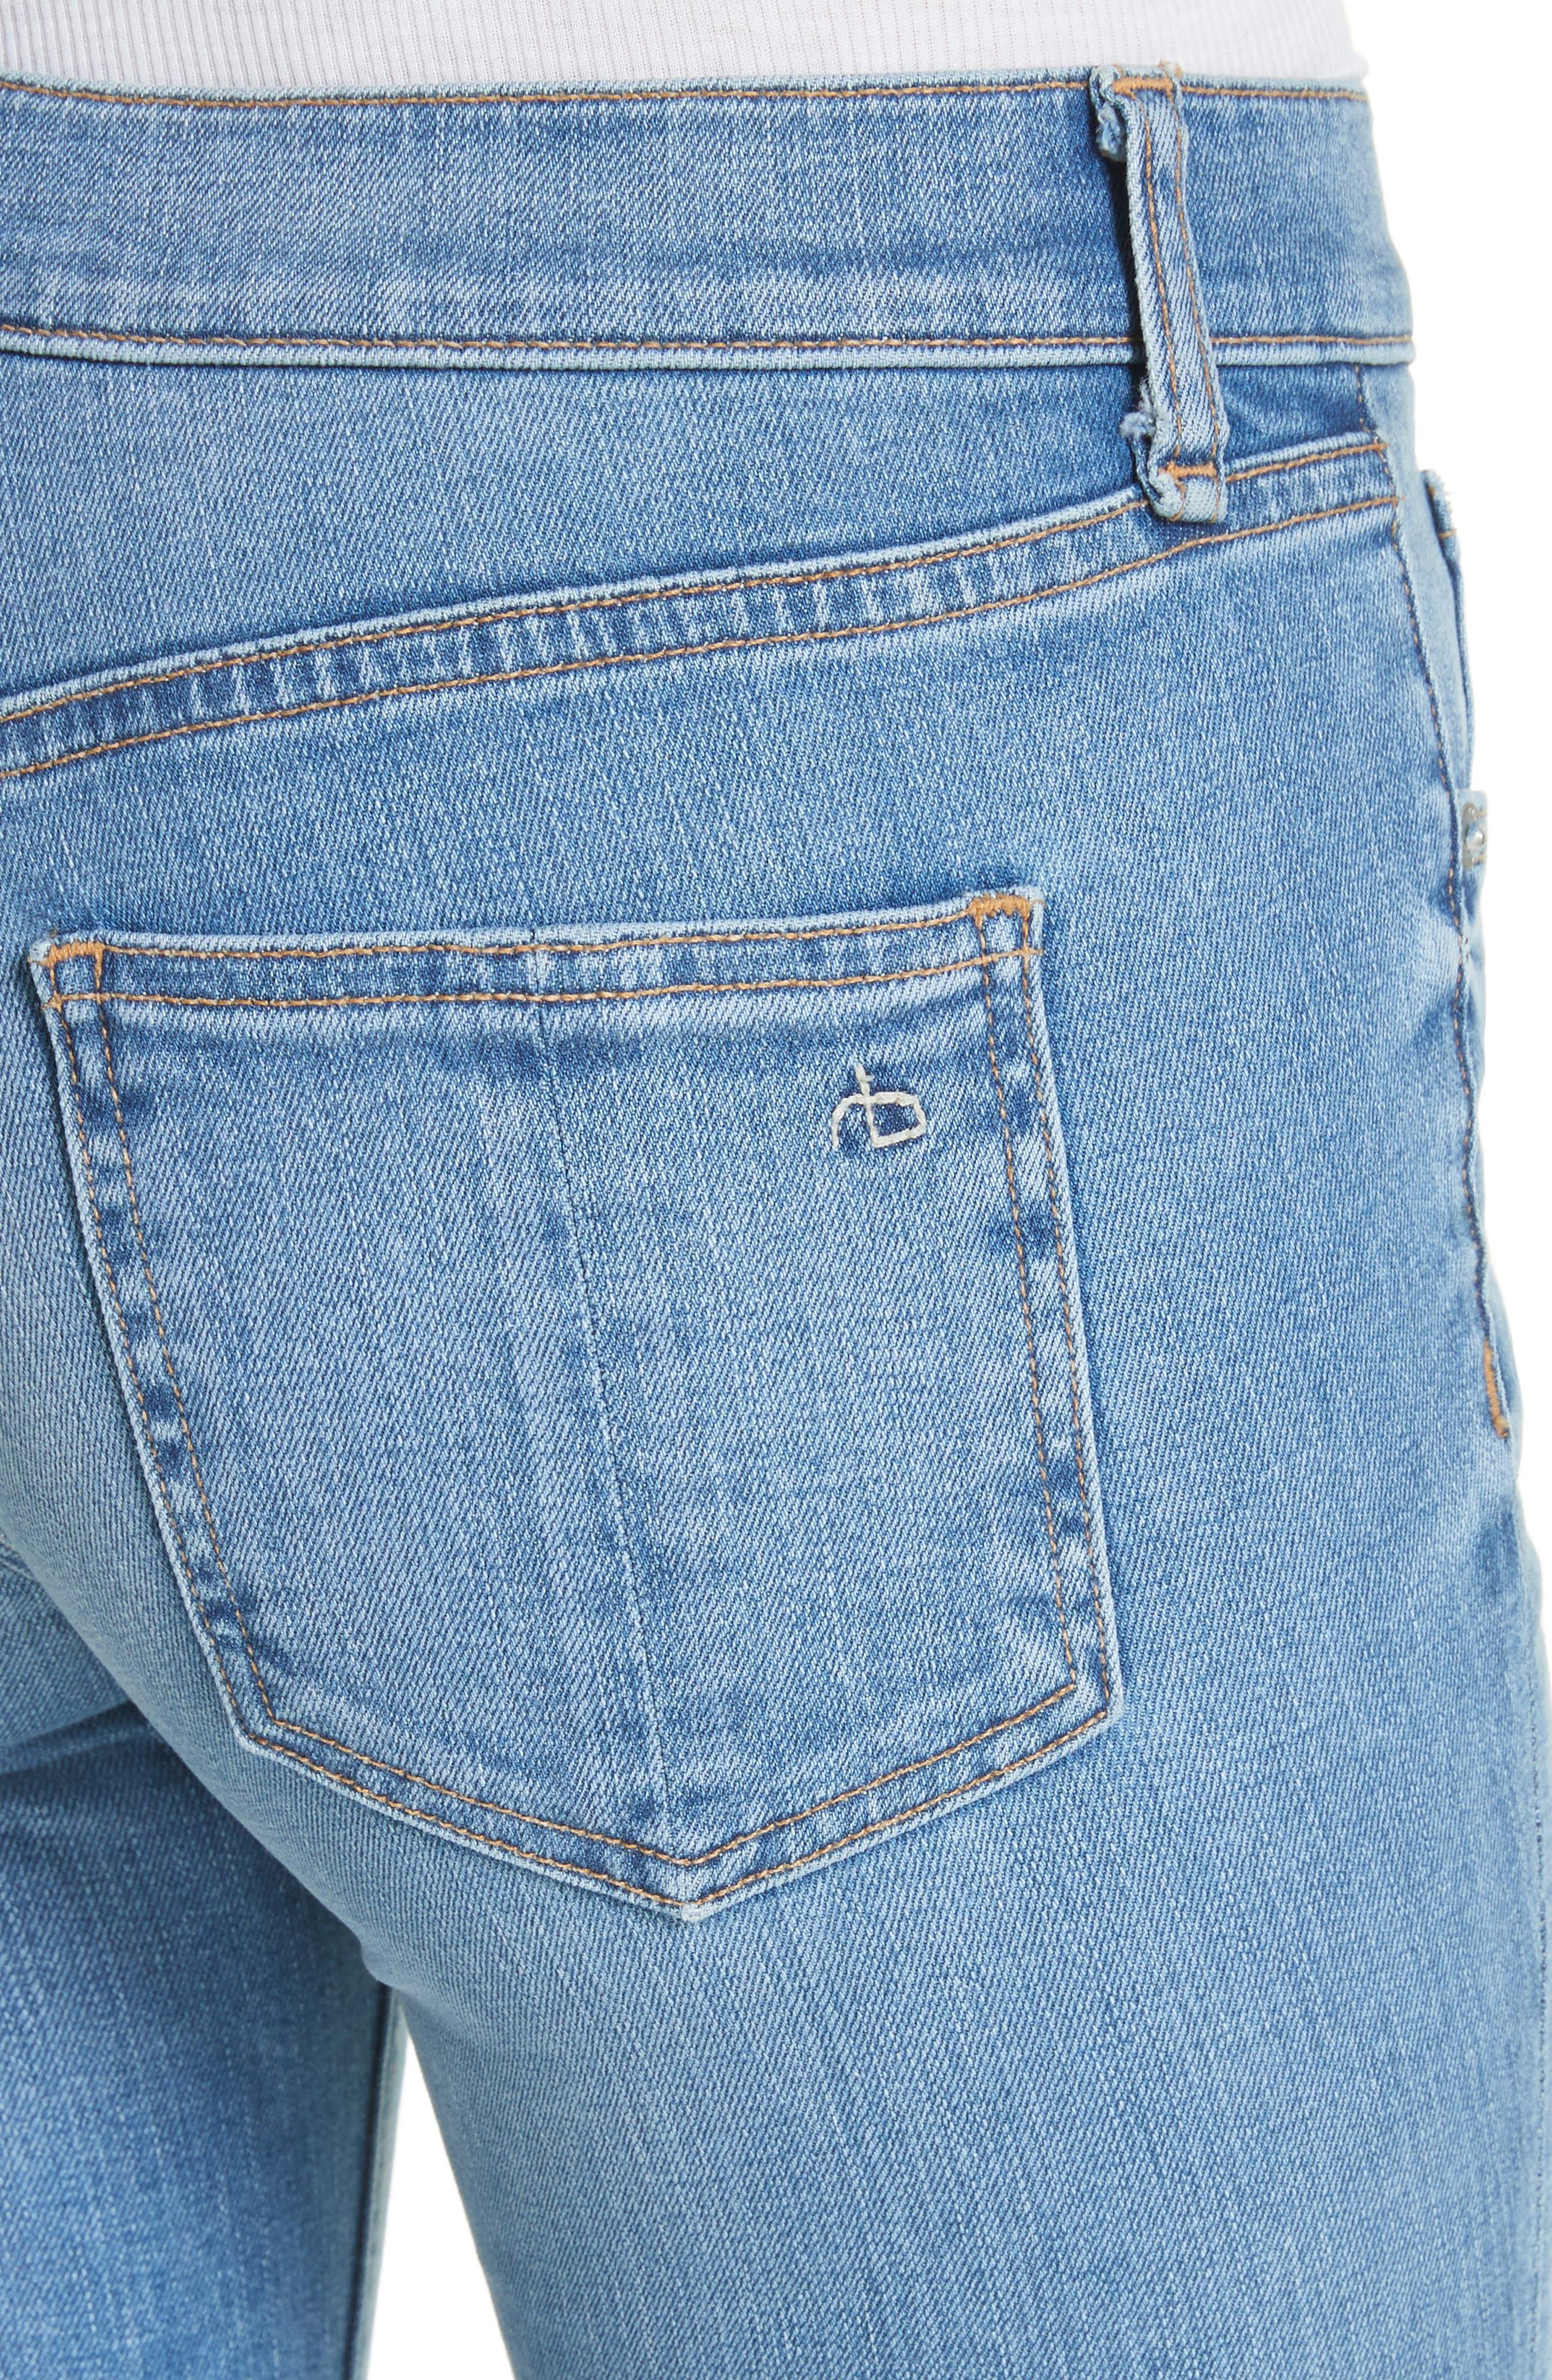 Raw Hem Capri Skinny Jeans,                             Alternate thumbnail 4, color,                             Levee